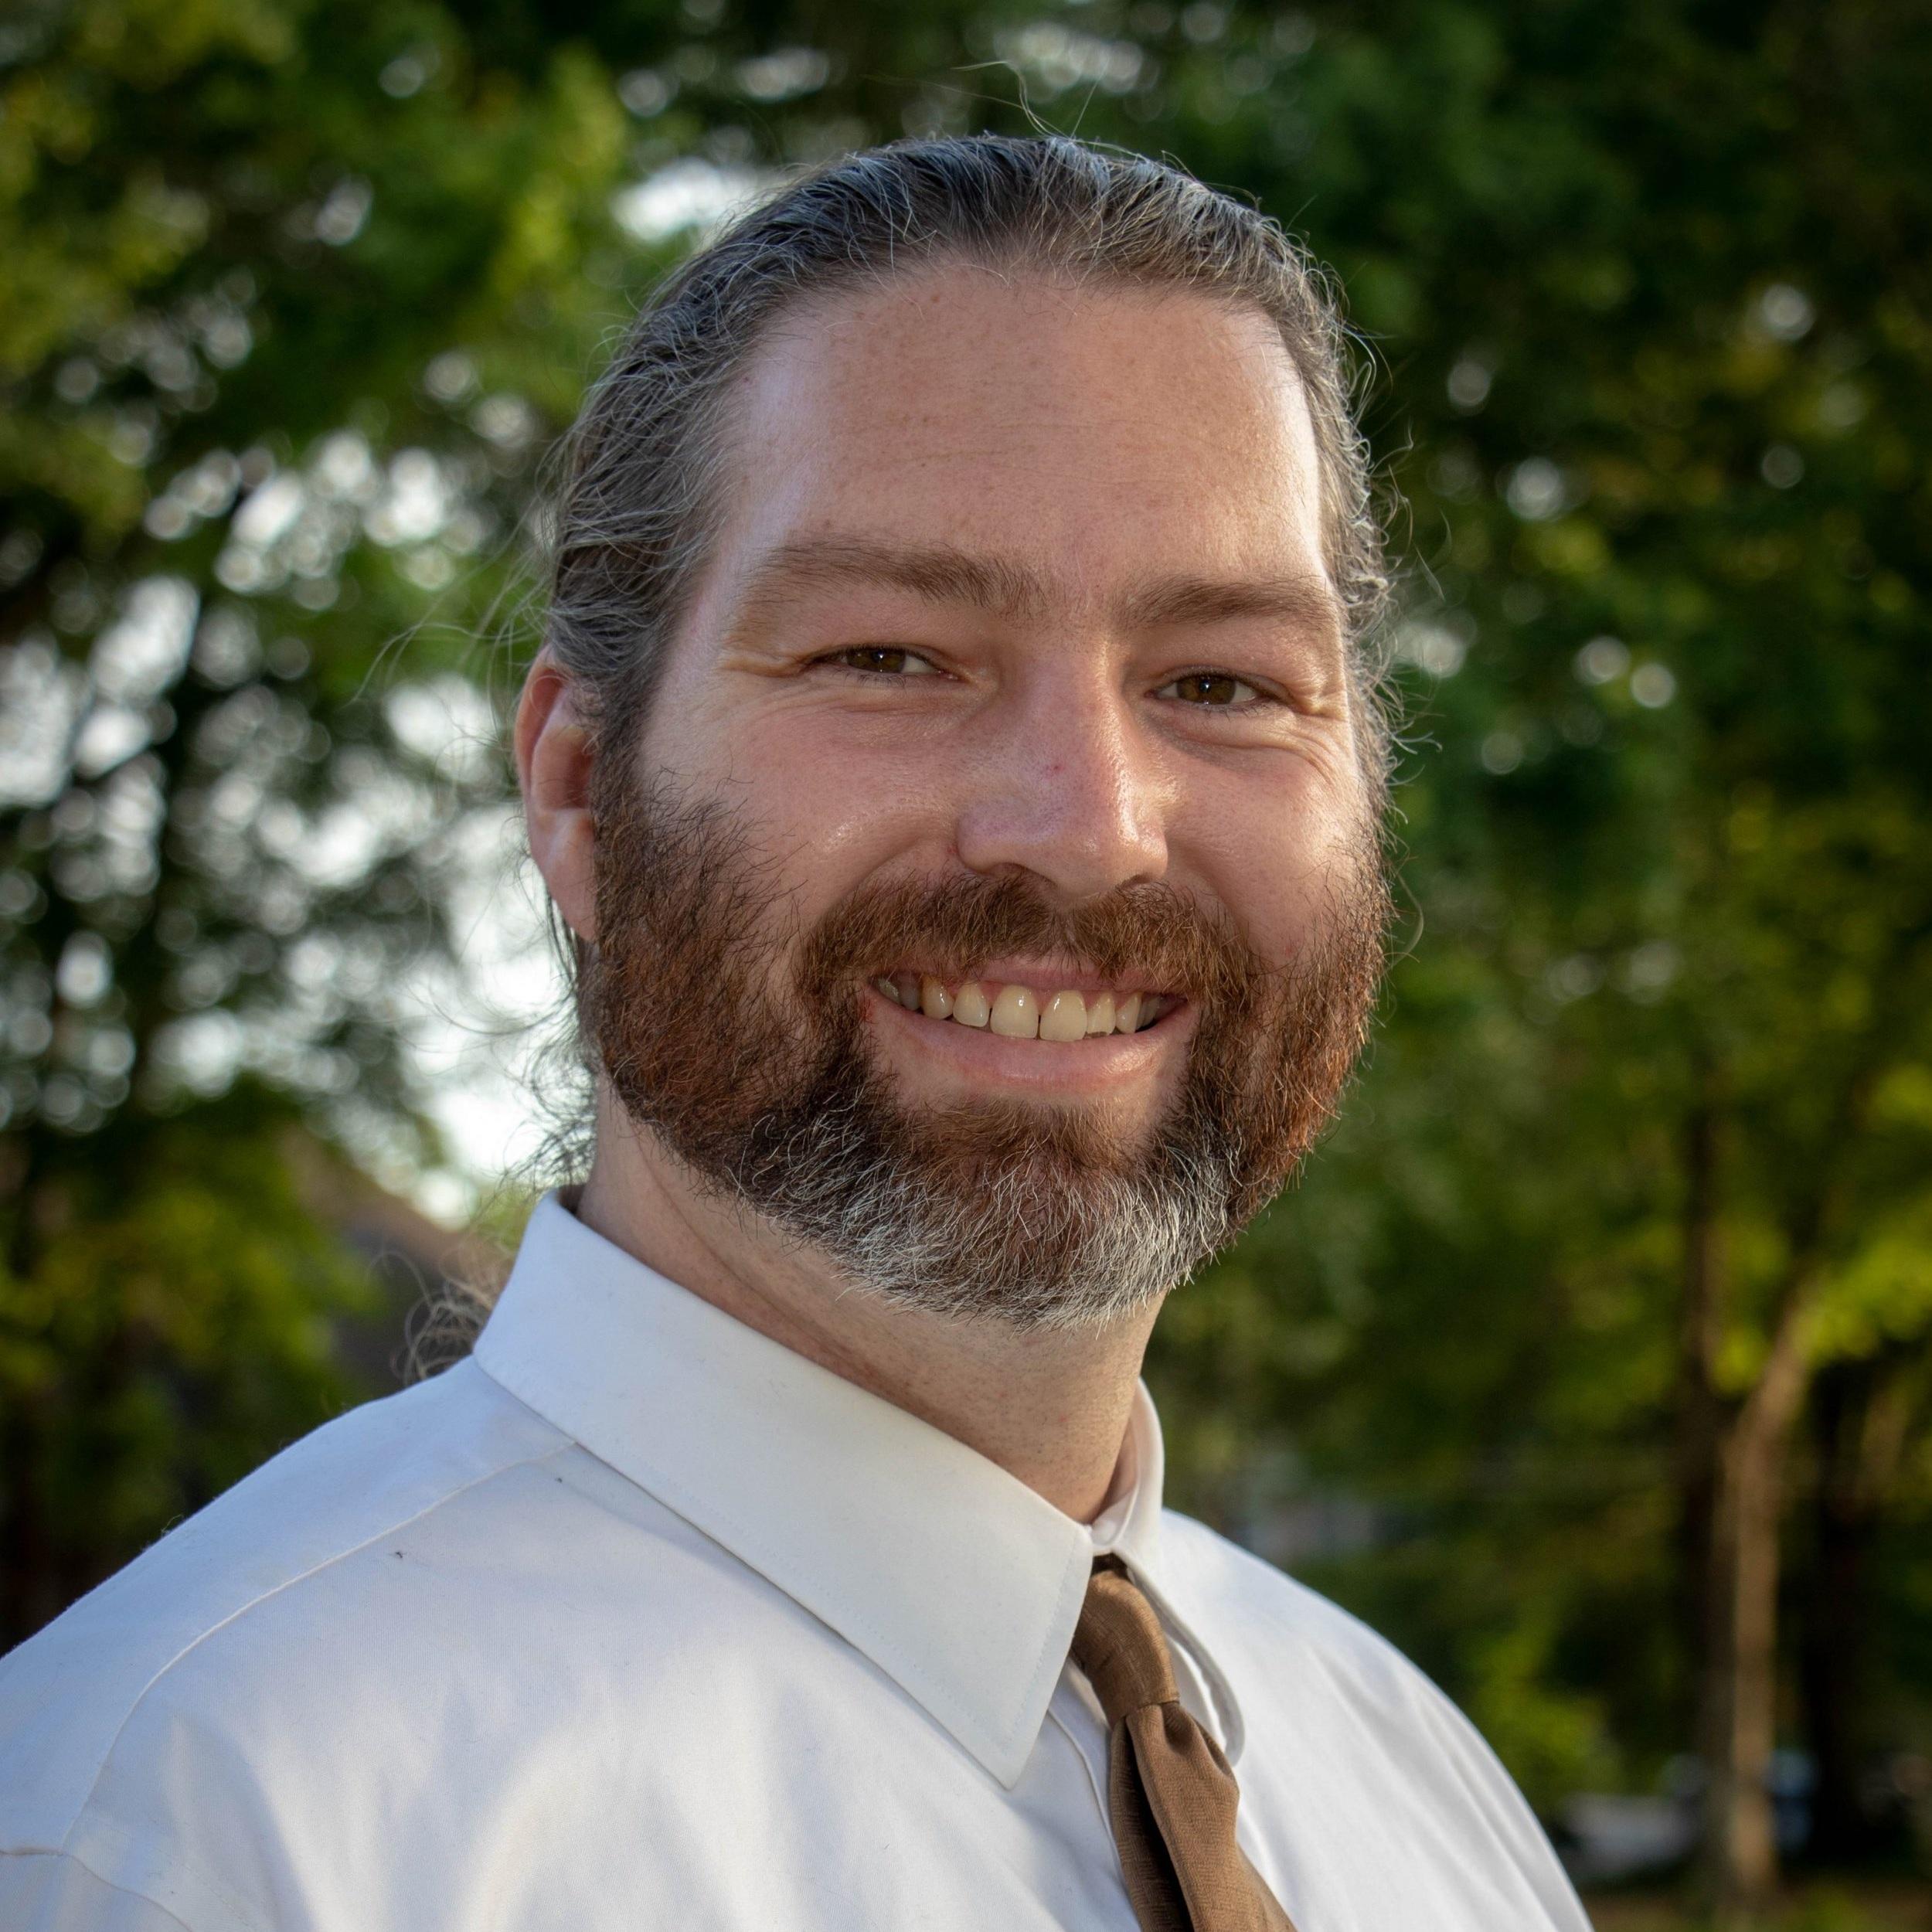 Erik Hofmeister, DVM, MS, MA, DACVVA, DECVAA - Professor of Veterinary Anesthesia, Clinical Sciences, Auburn University College of Veterinary MedicineDeputy Editor, Veterinary Anaesthesia and Analgesia